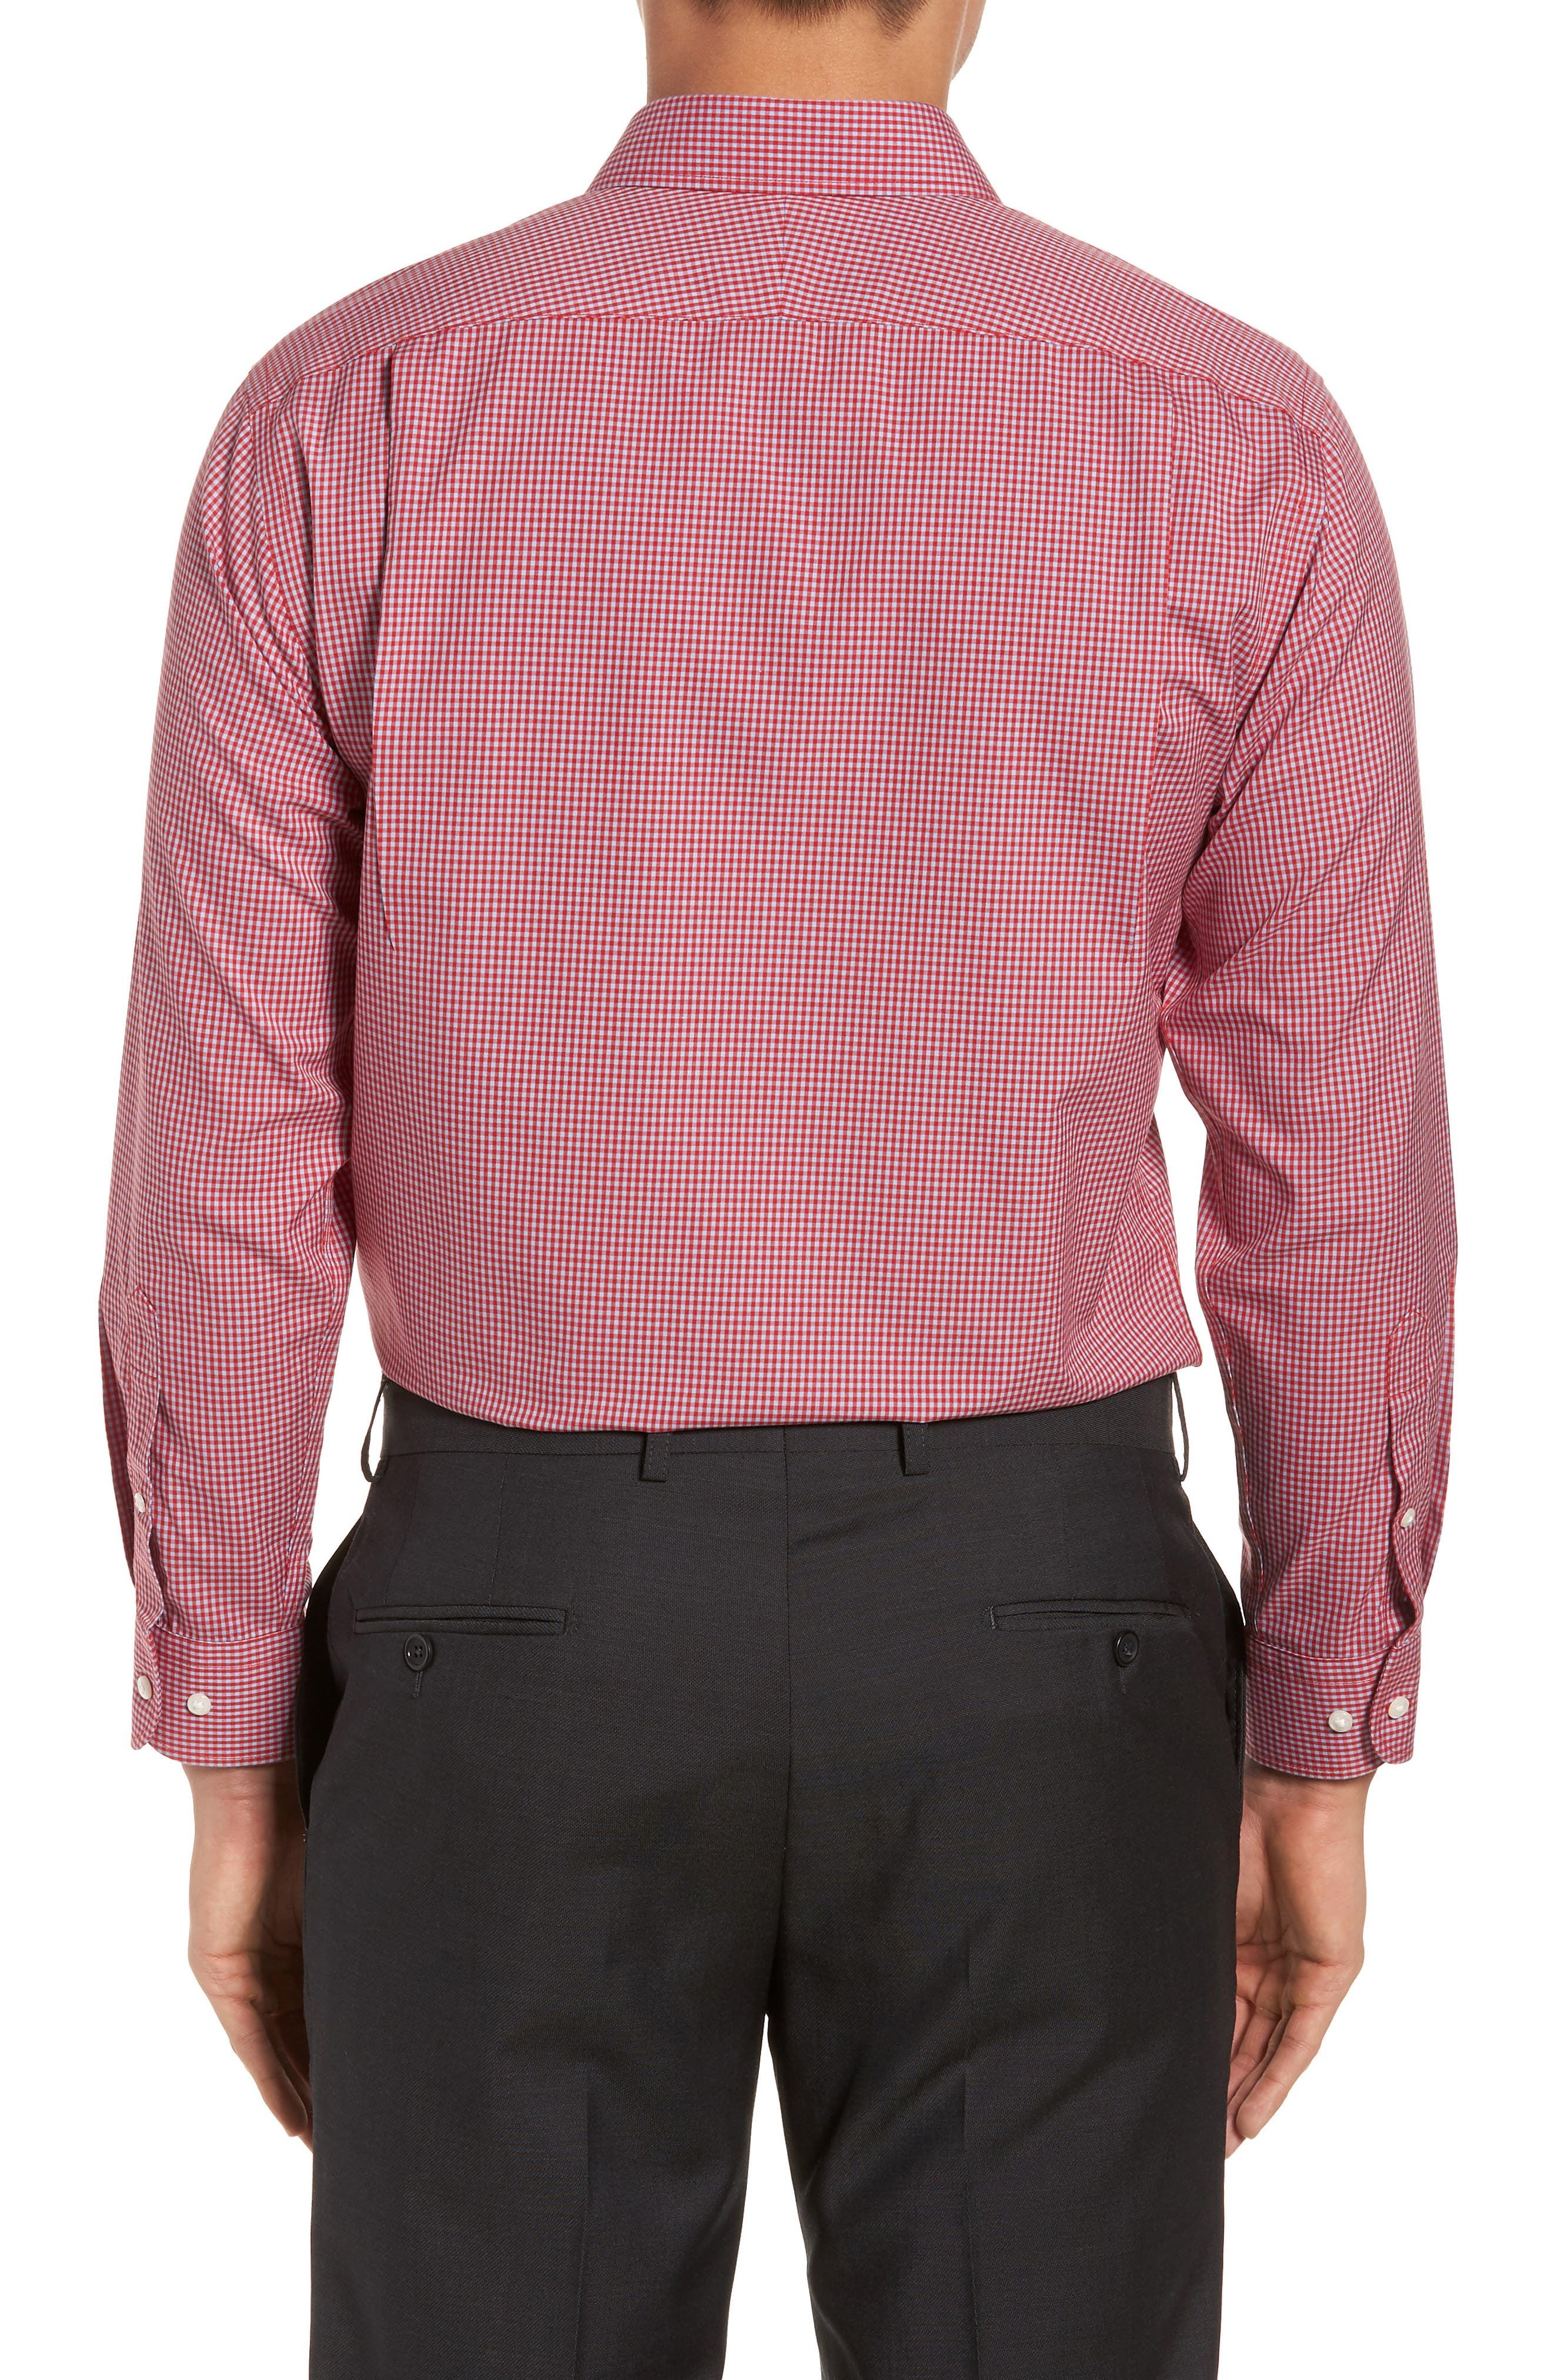 Smartcare<sup>™</sup> Trim Fit Check Dress Shirt,                             Alternate thumbnail 3, color,                             Red Barbados